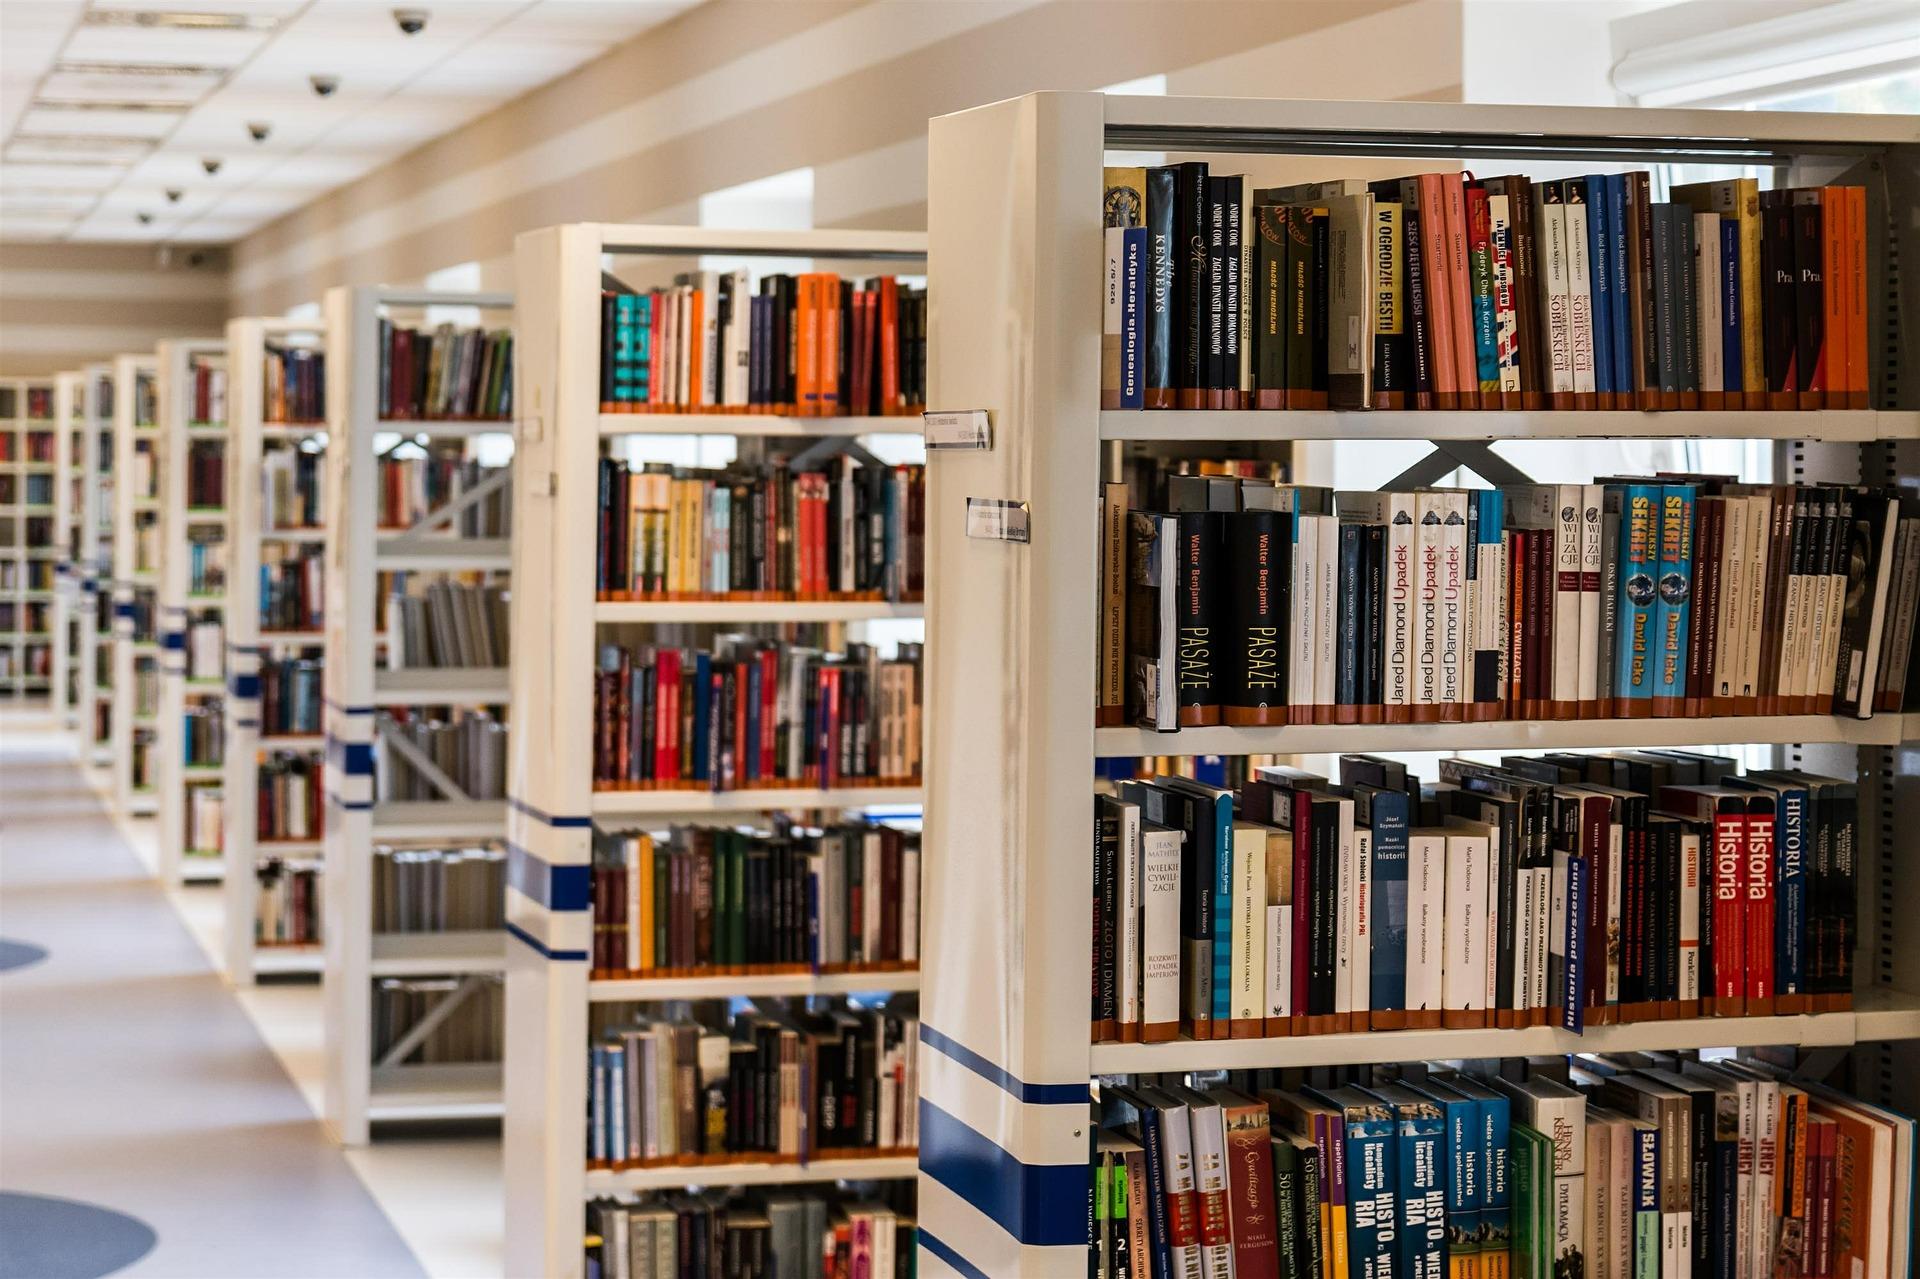 Lugares para escribir: bibliotecas o salas de estudio